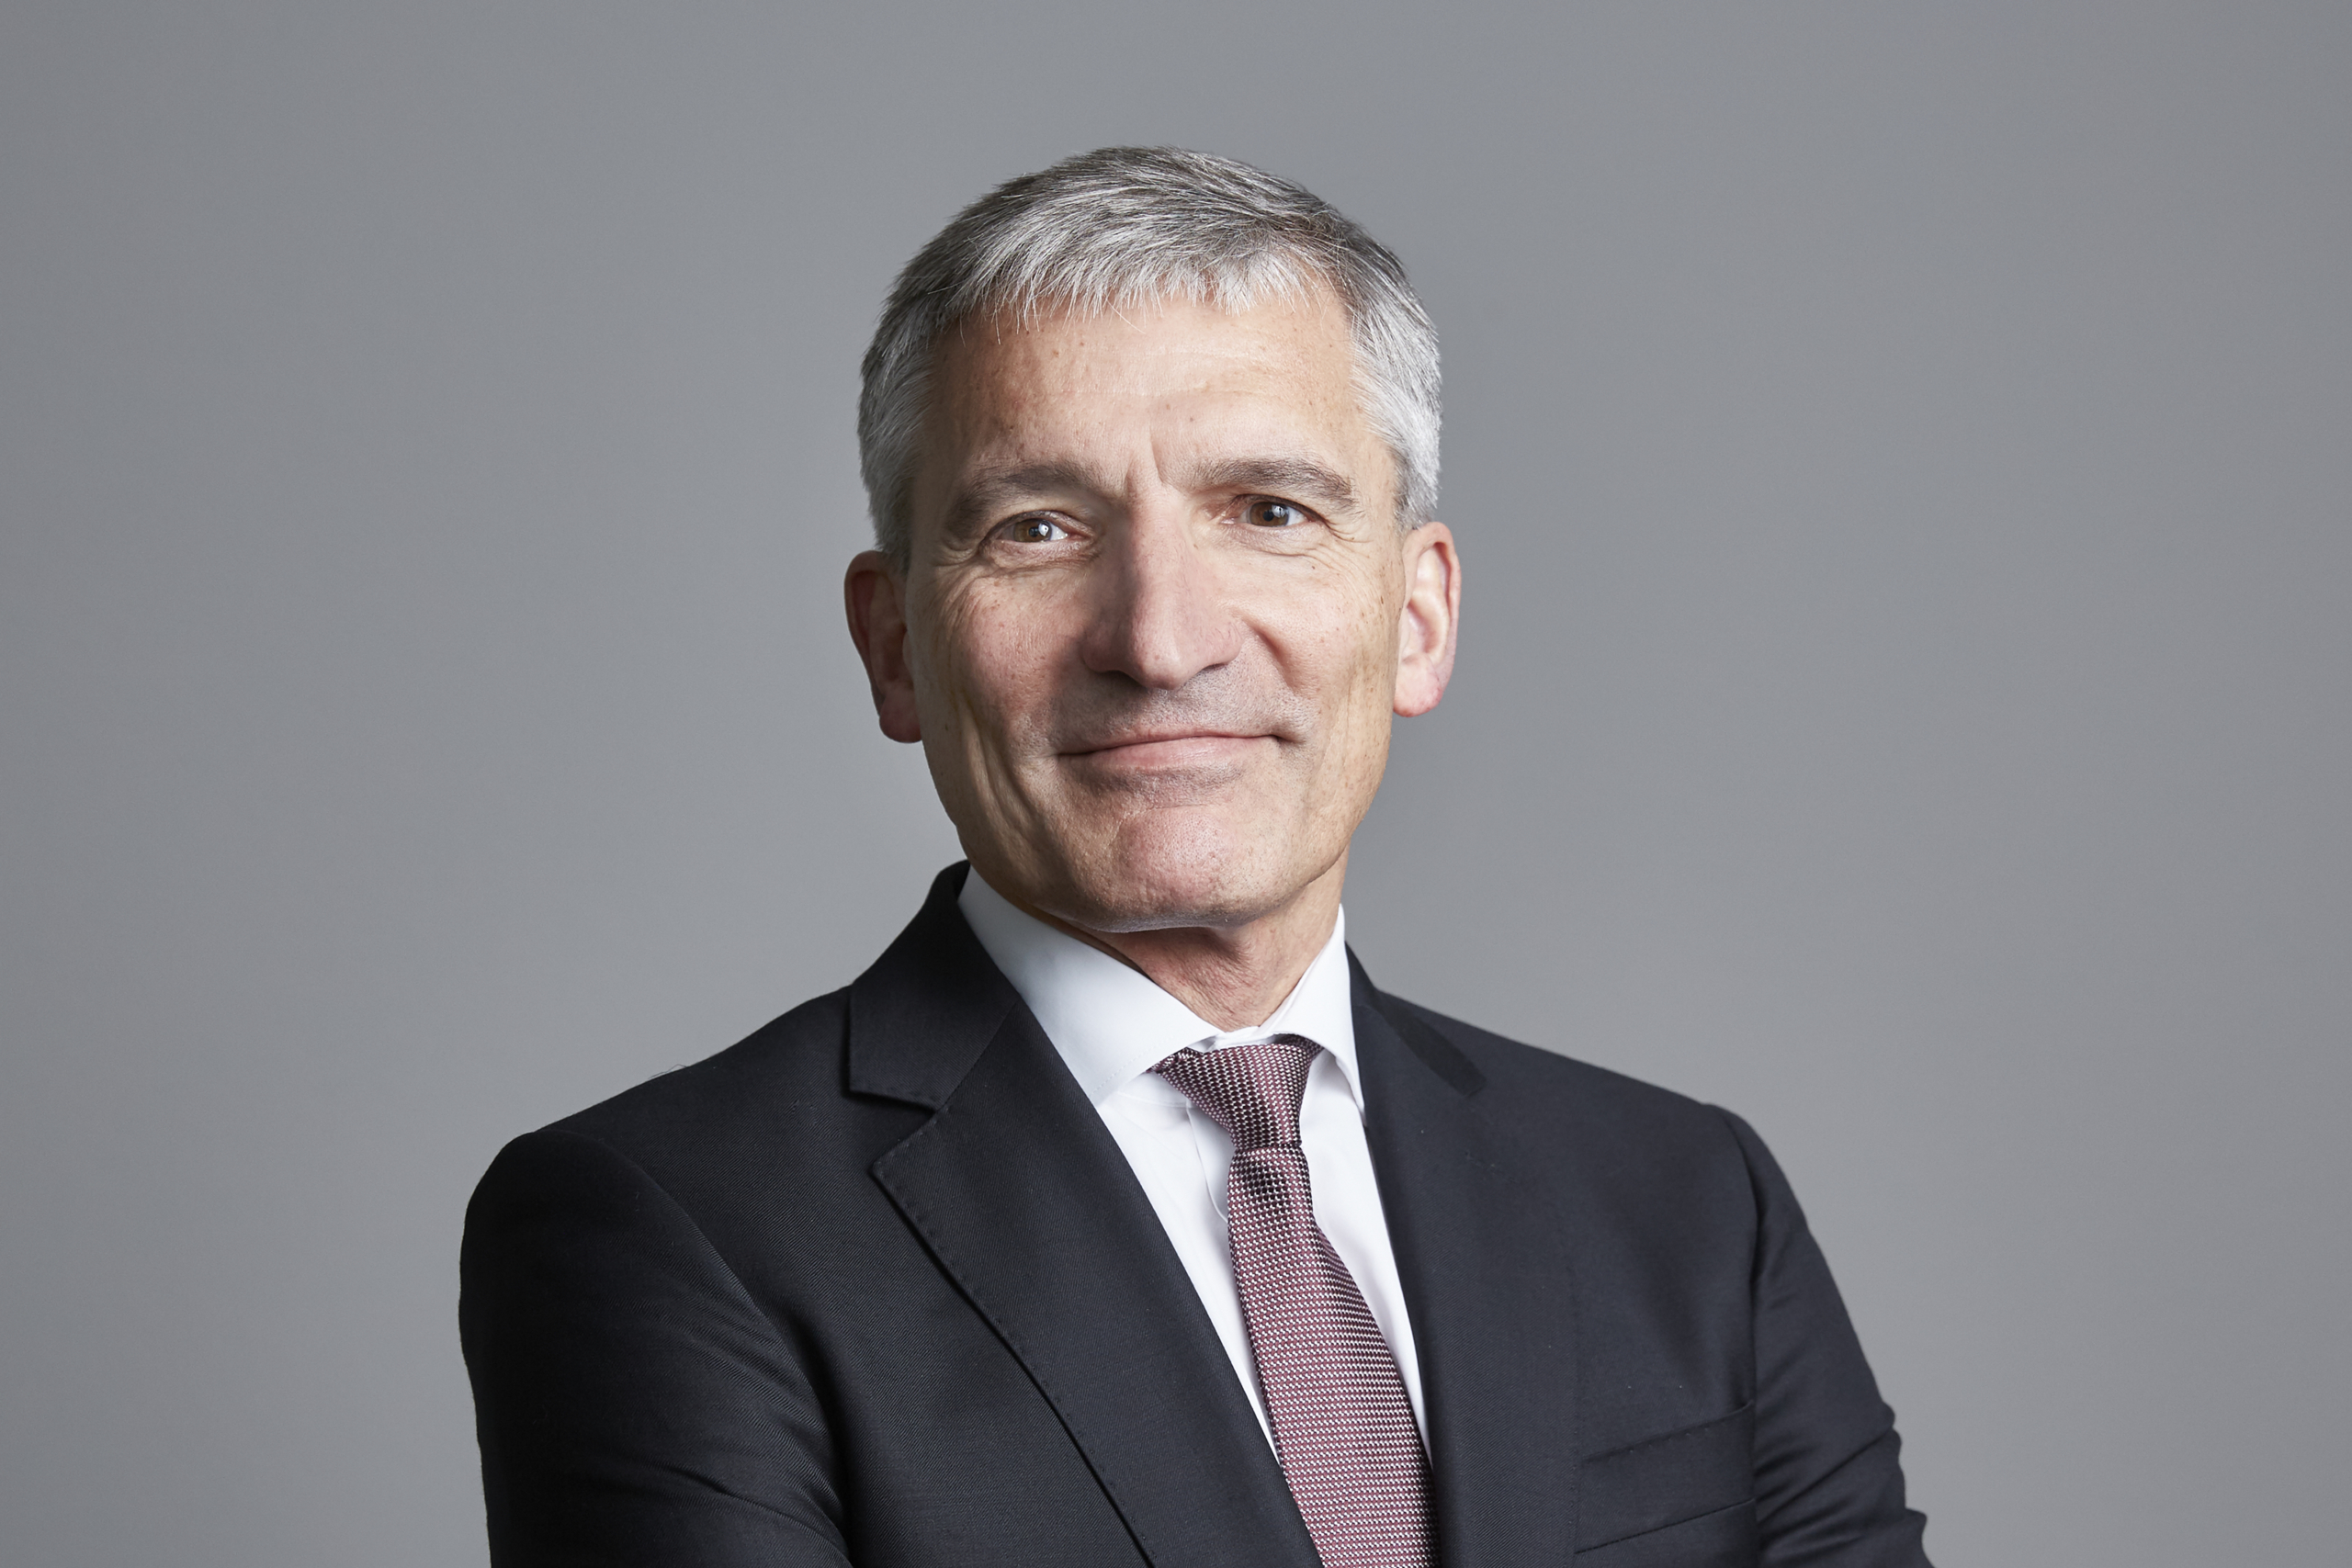 Geschäftsführender Gesellschafter Matthias Bäcker